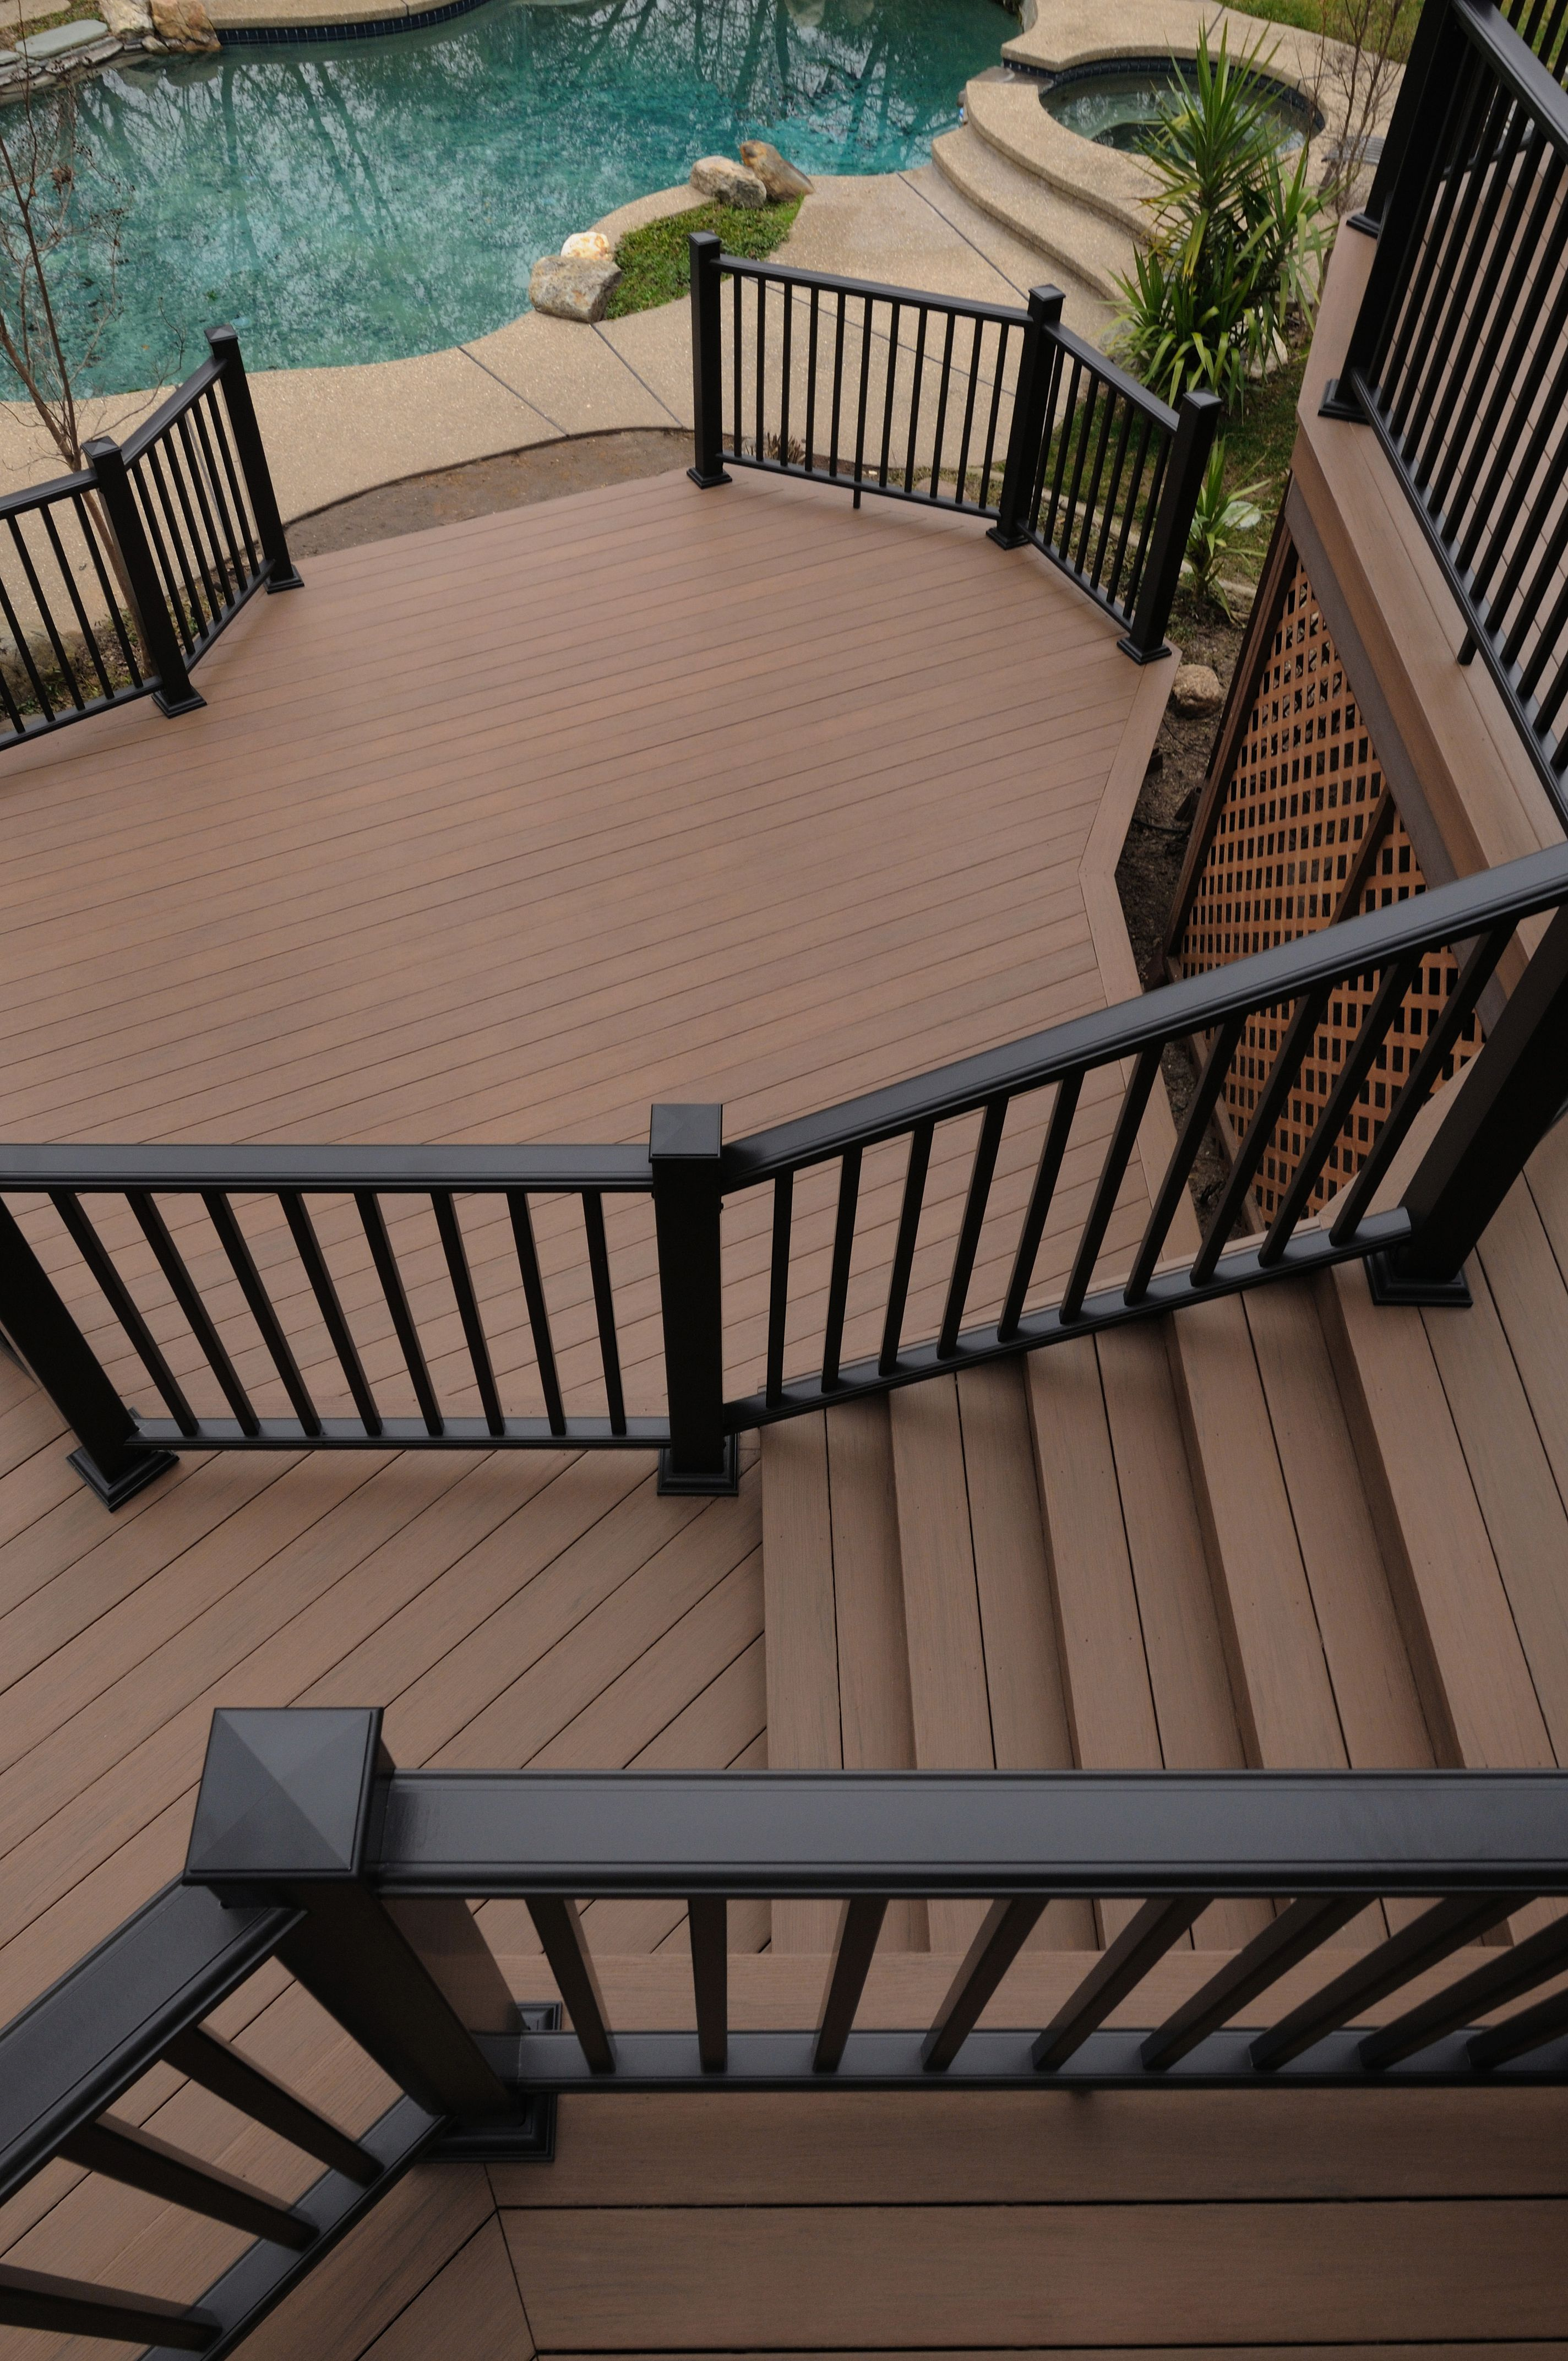 Best Azek Morado Deck Rail Azek Decking Diy Deck Deck Railings 400 x 300